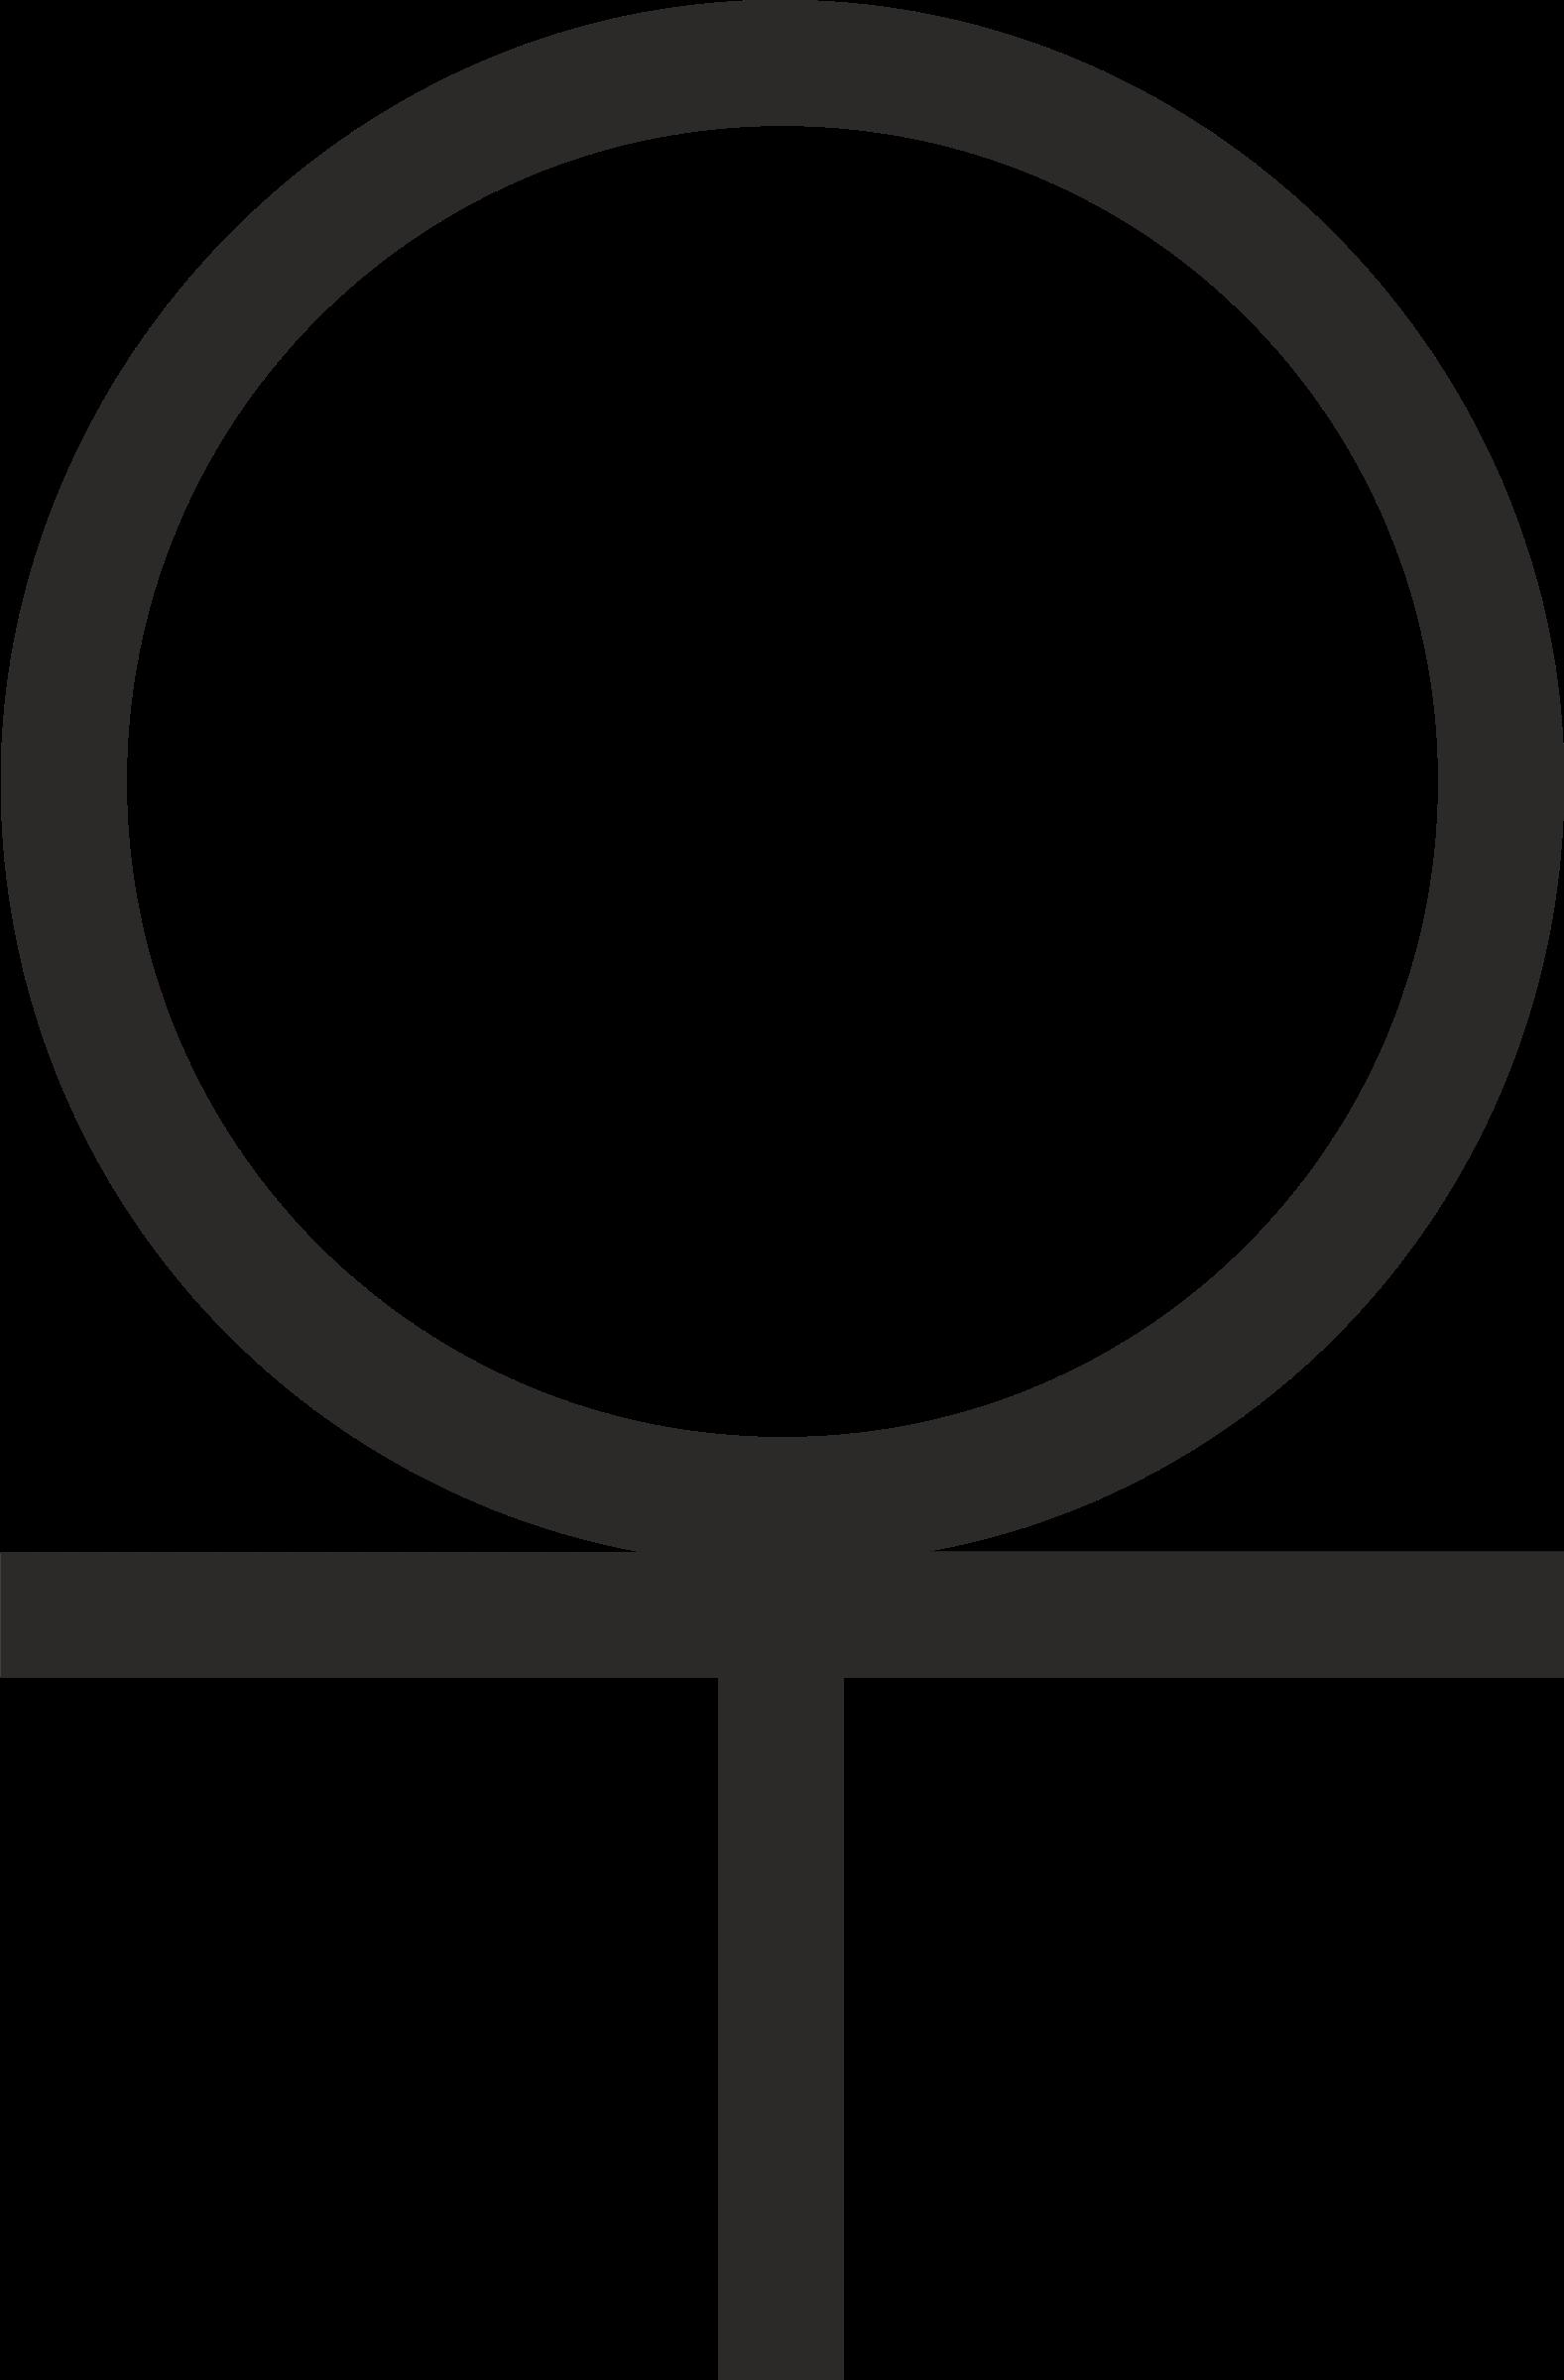 Ankh clipart cross Cross Circle Below 3/4 Ankh